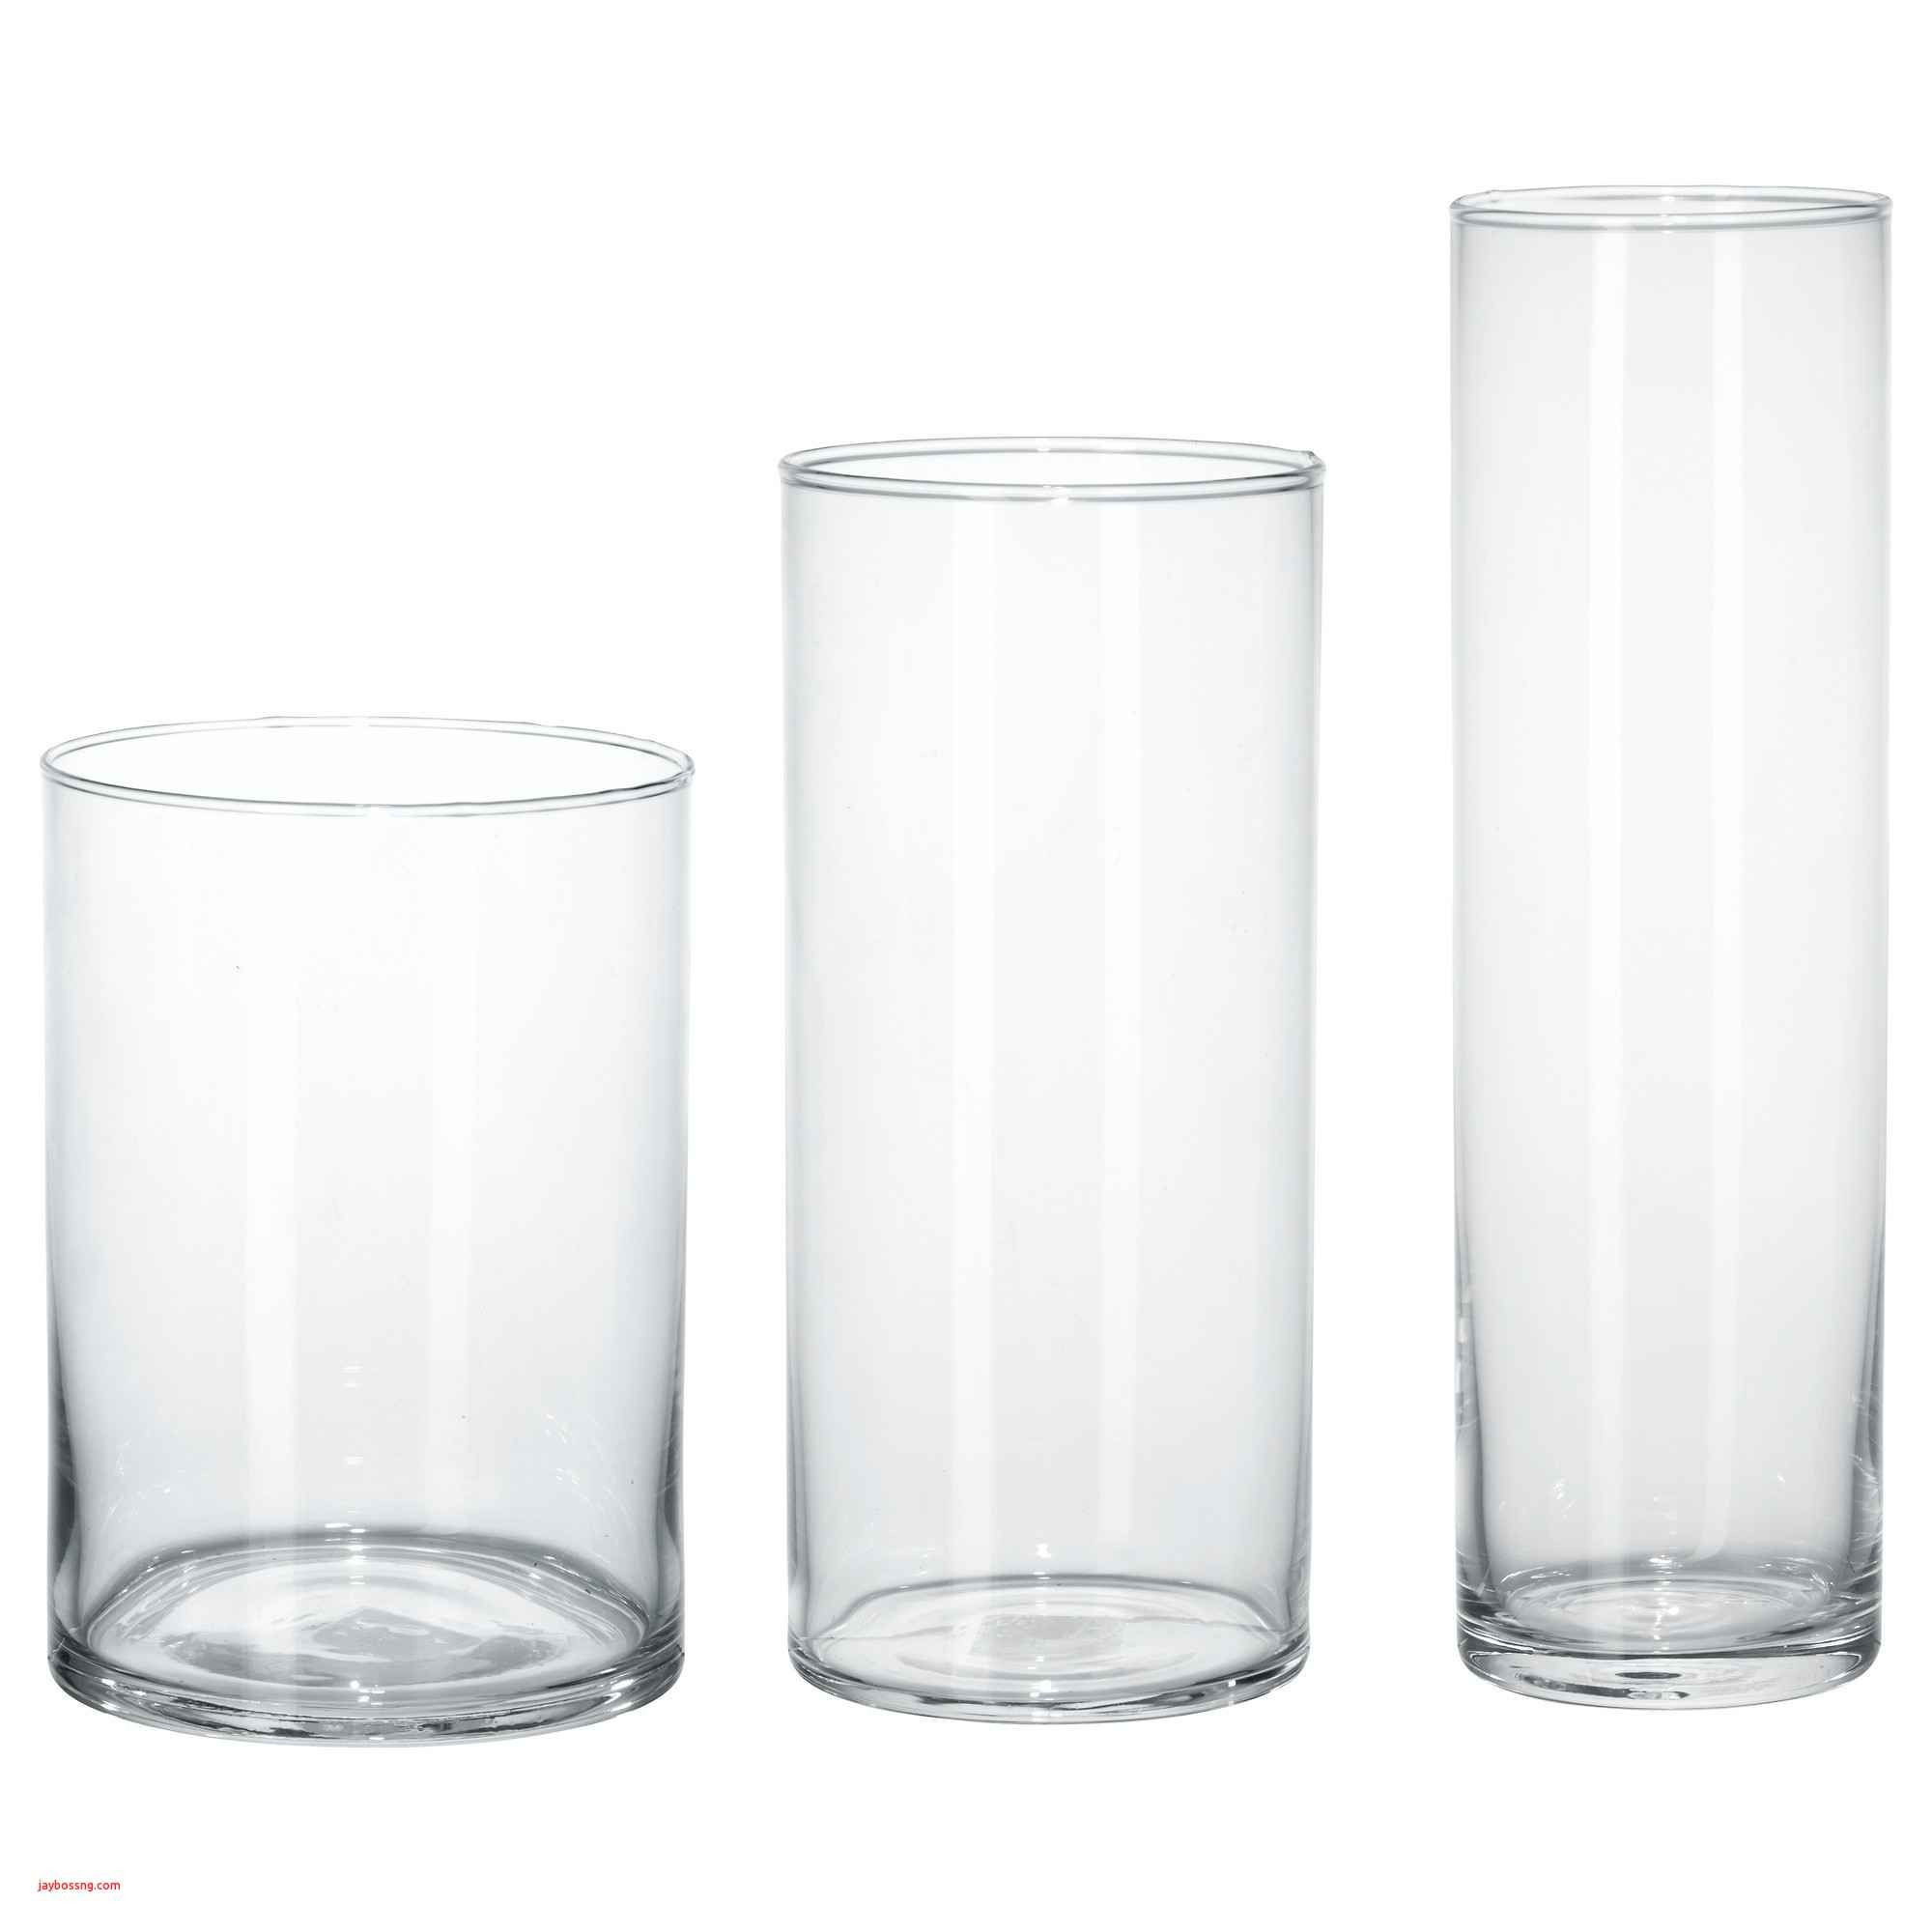 square glass flower vases of brown glass vase fresh ikea white table created pe s5h vases ikea in brown glass vase fresh ikea white table created pe s5h vases ikea vase i 0d bladet